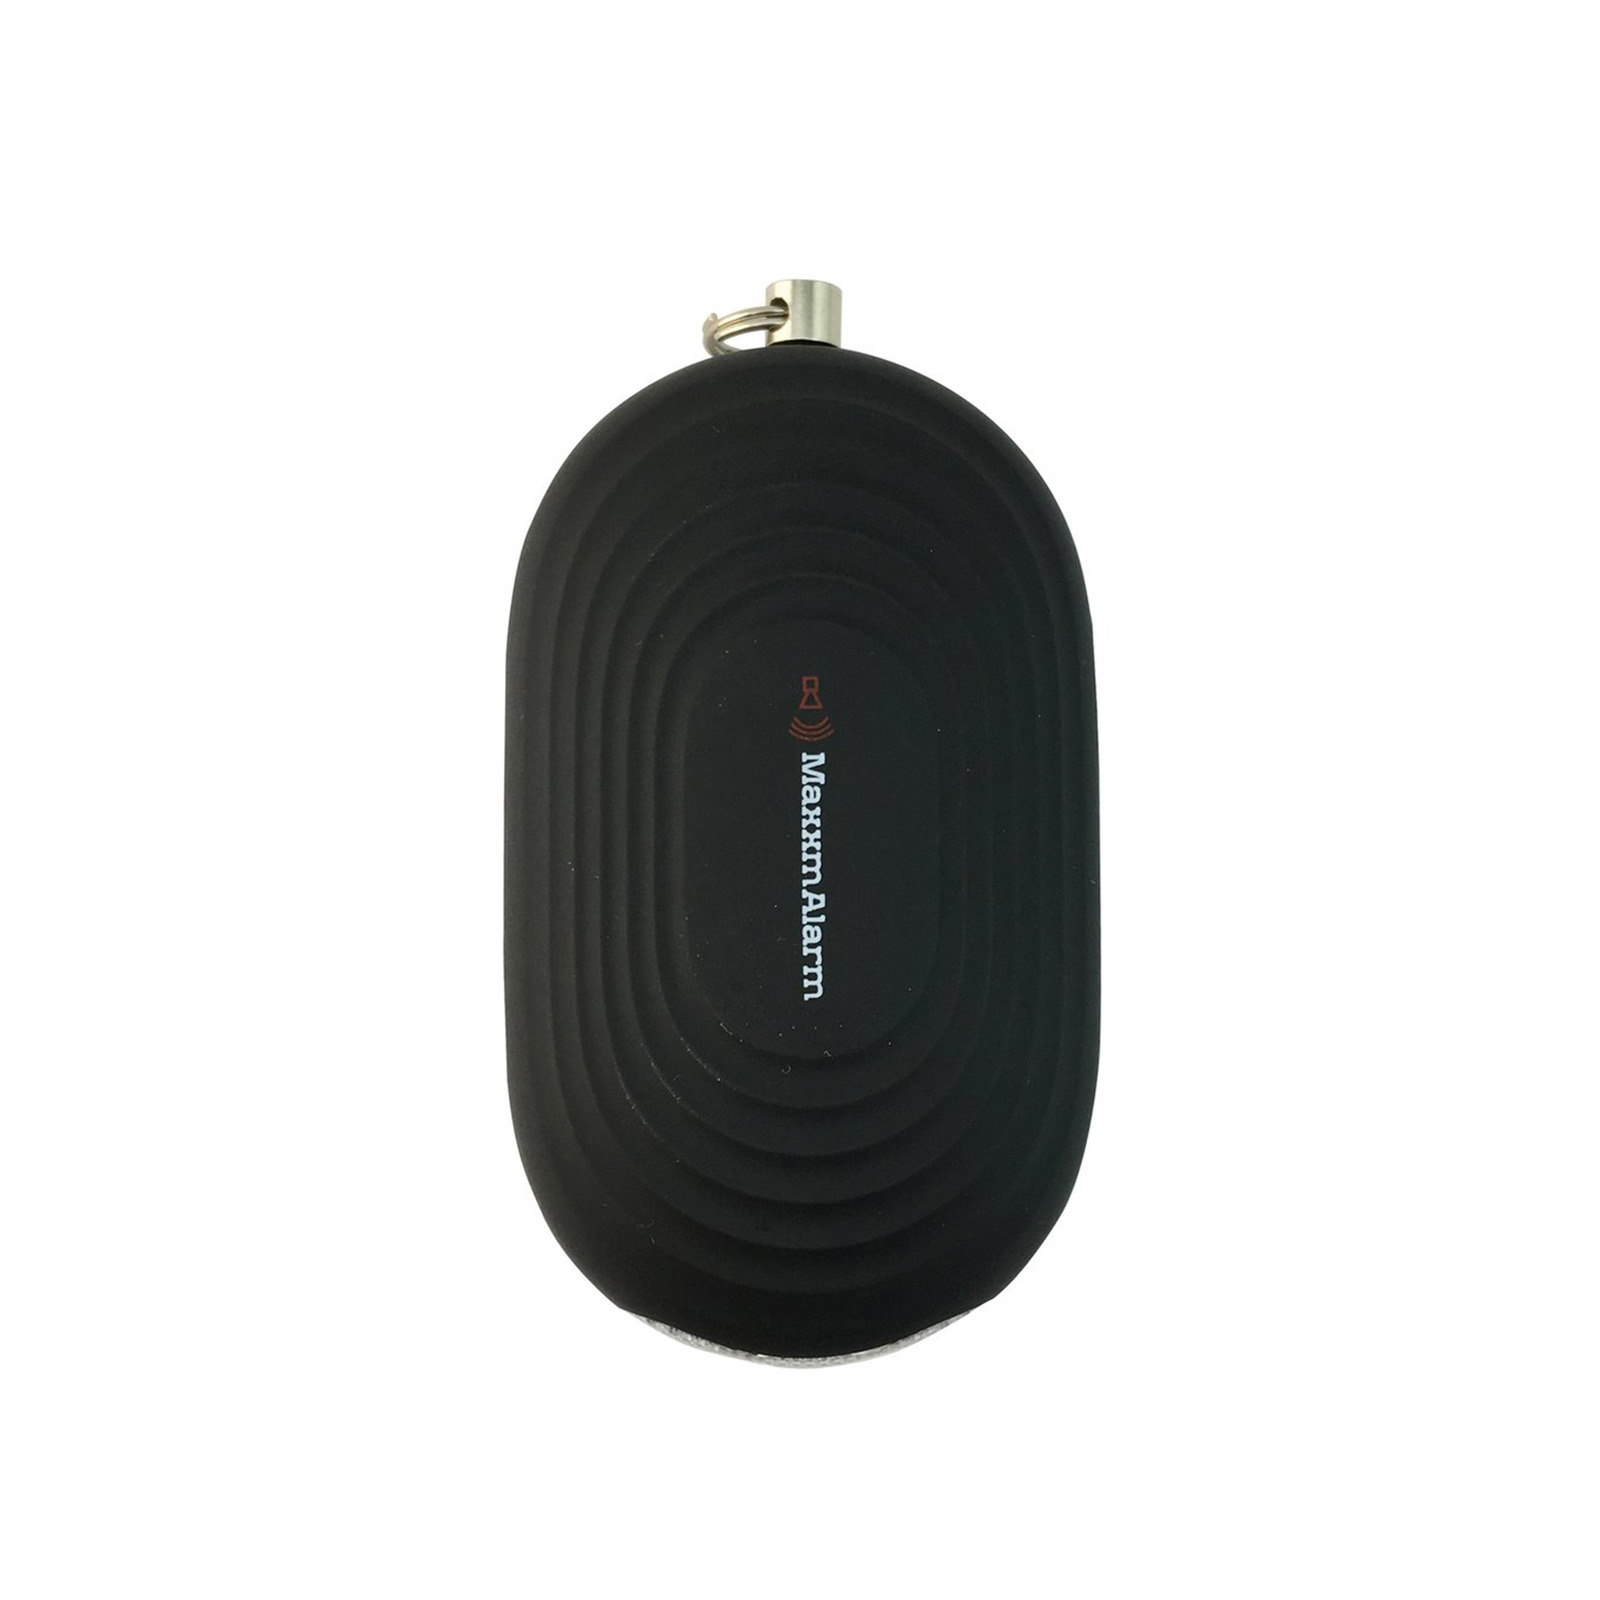 iMaxAlarm Portable Personal Alarm With Light (Matte Black)